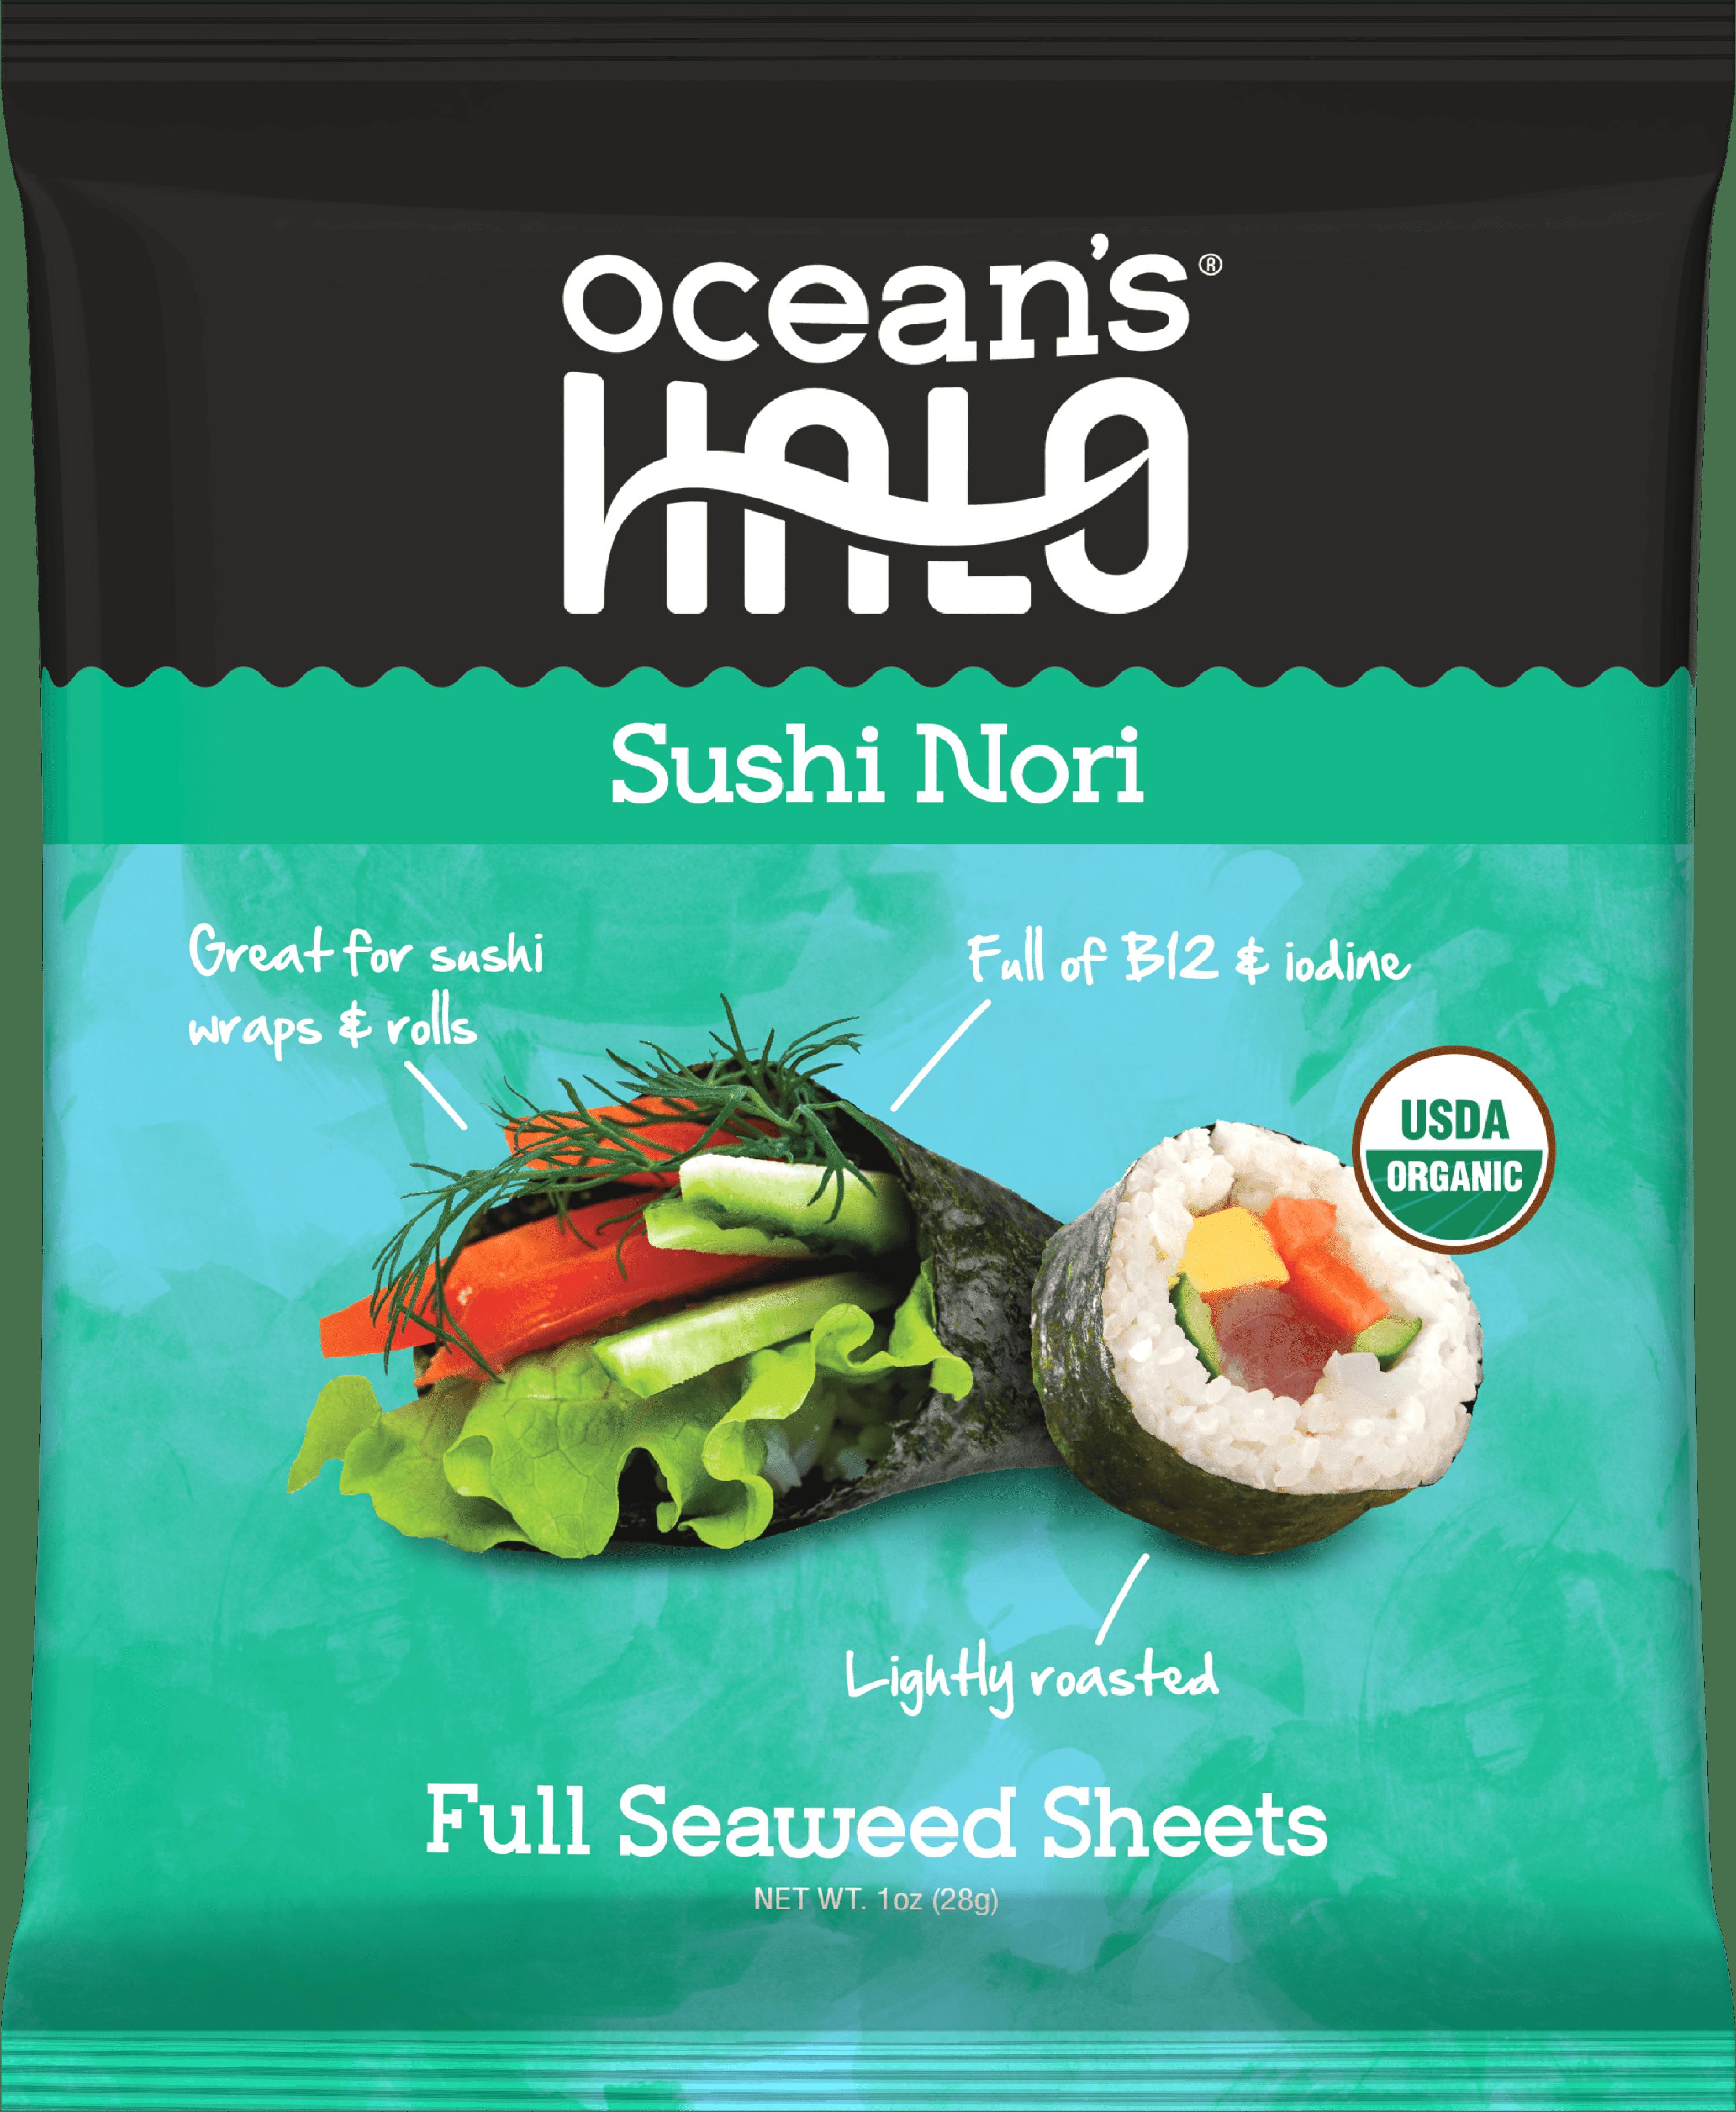 Ocean S Halo Organic Sushi Nori 12 Pack 120 Sheets Total Walmart Com Walmart Com